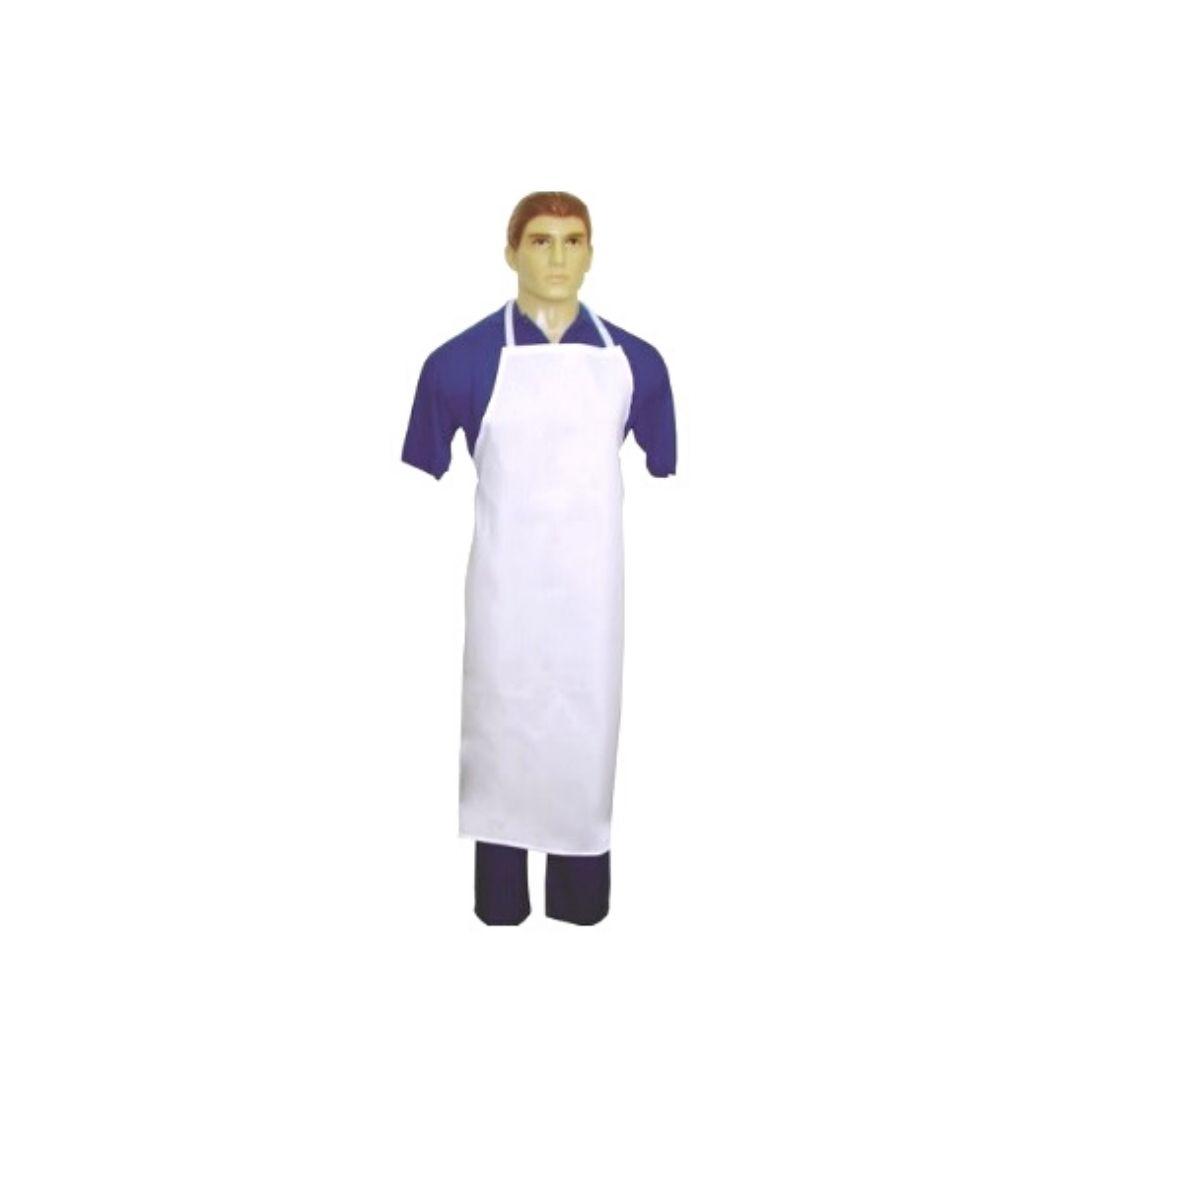 Avental De Cozinha Profissional Emborrachado 110x63cm kit c/ 10